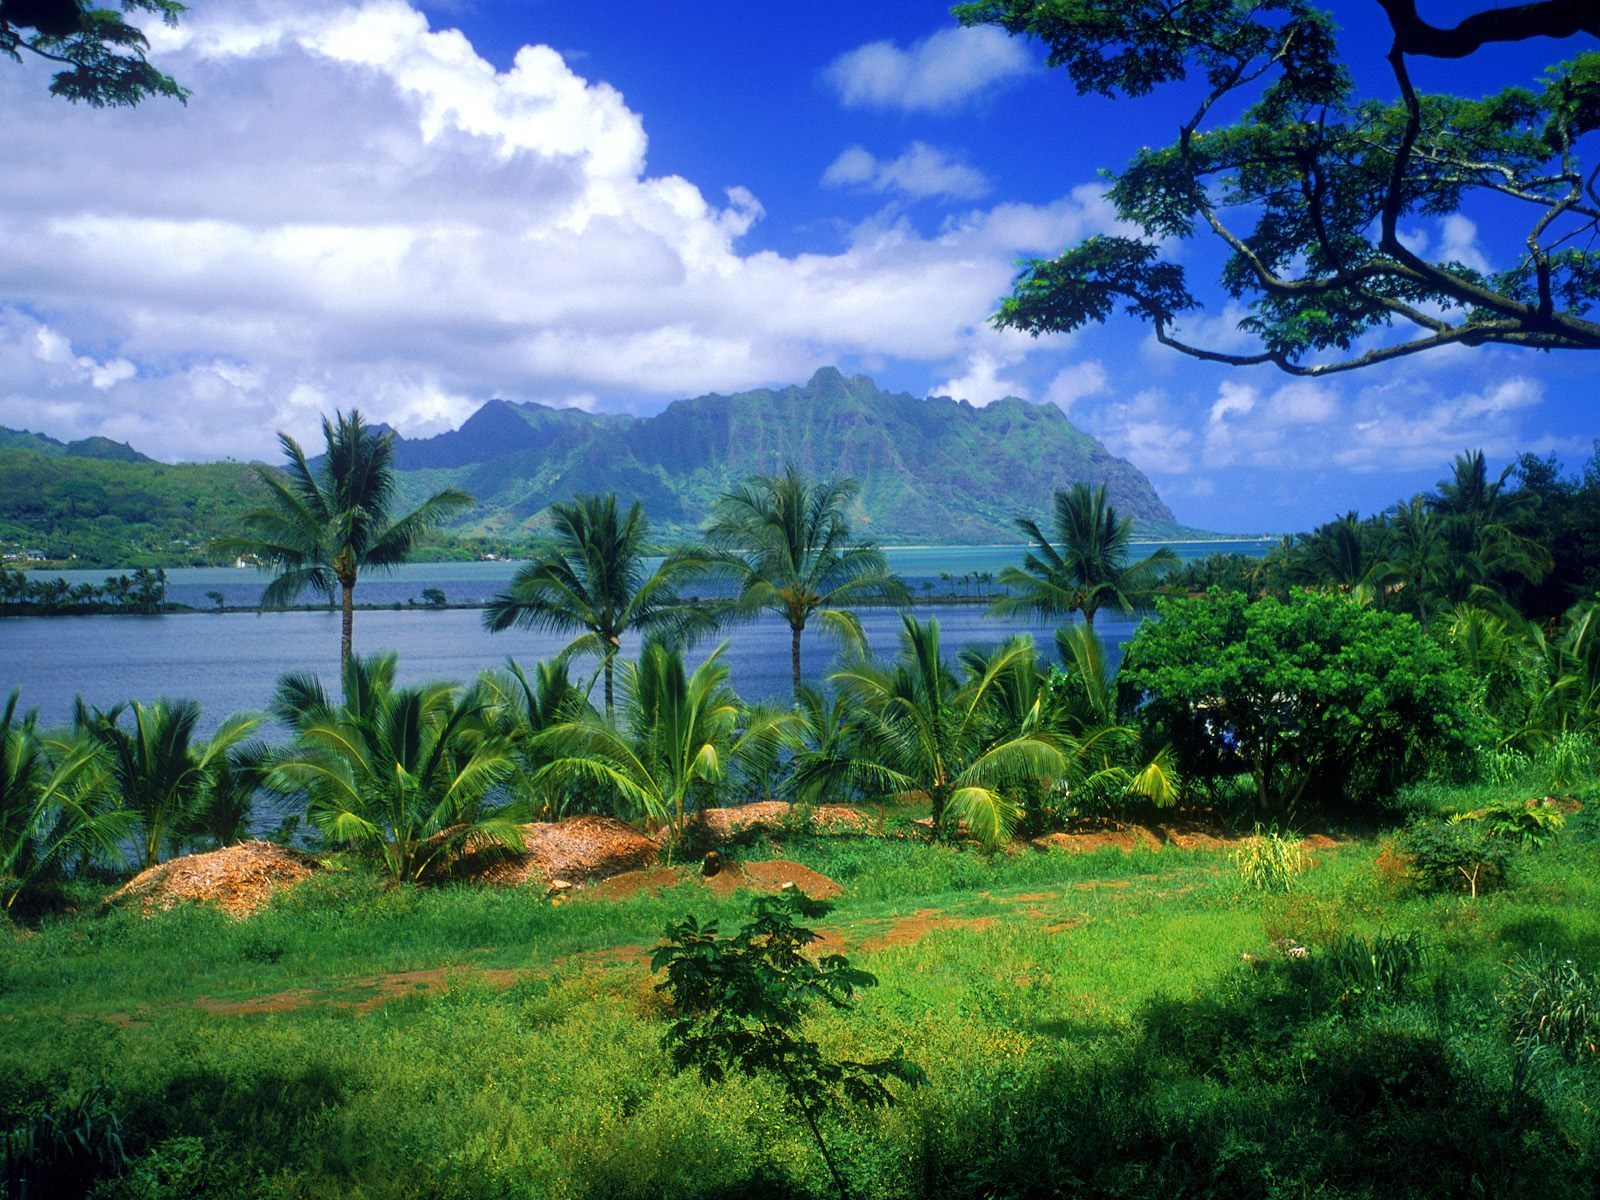 fonds ecran hawaii - Page 2